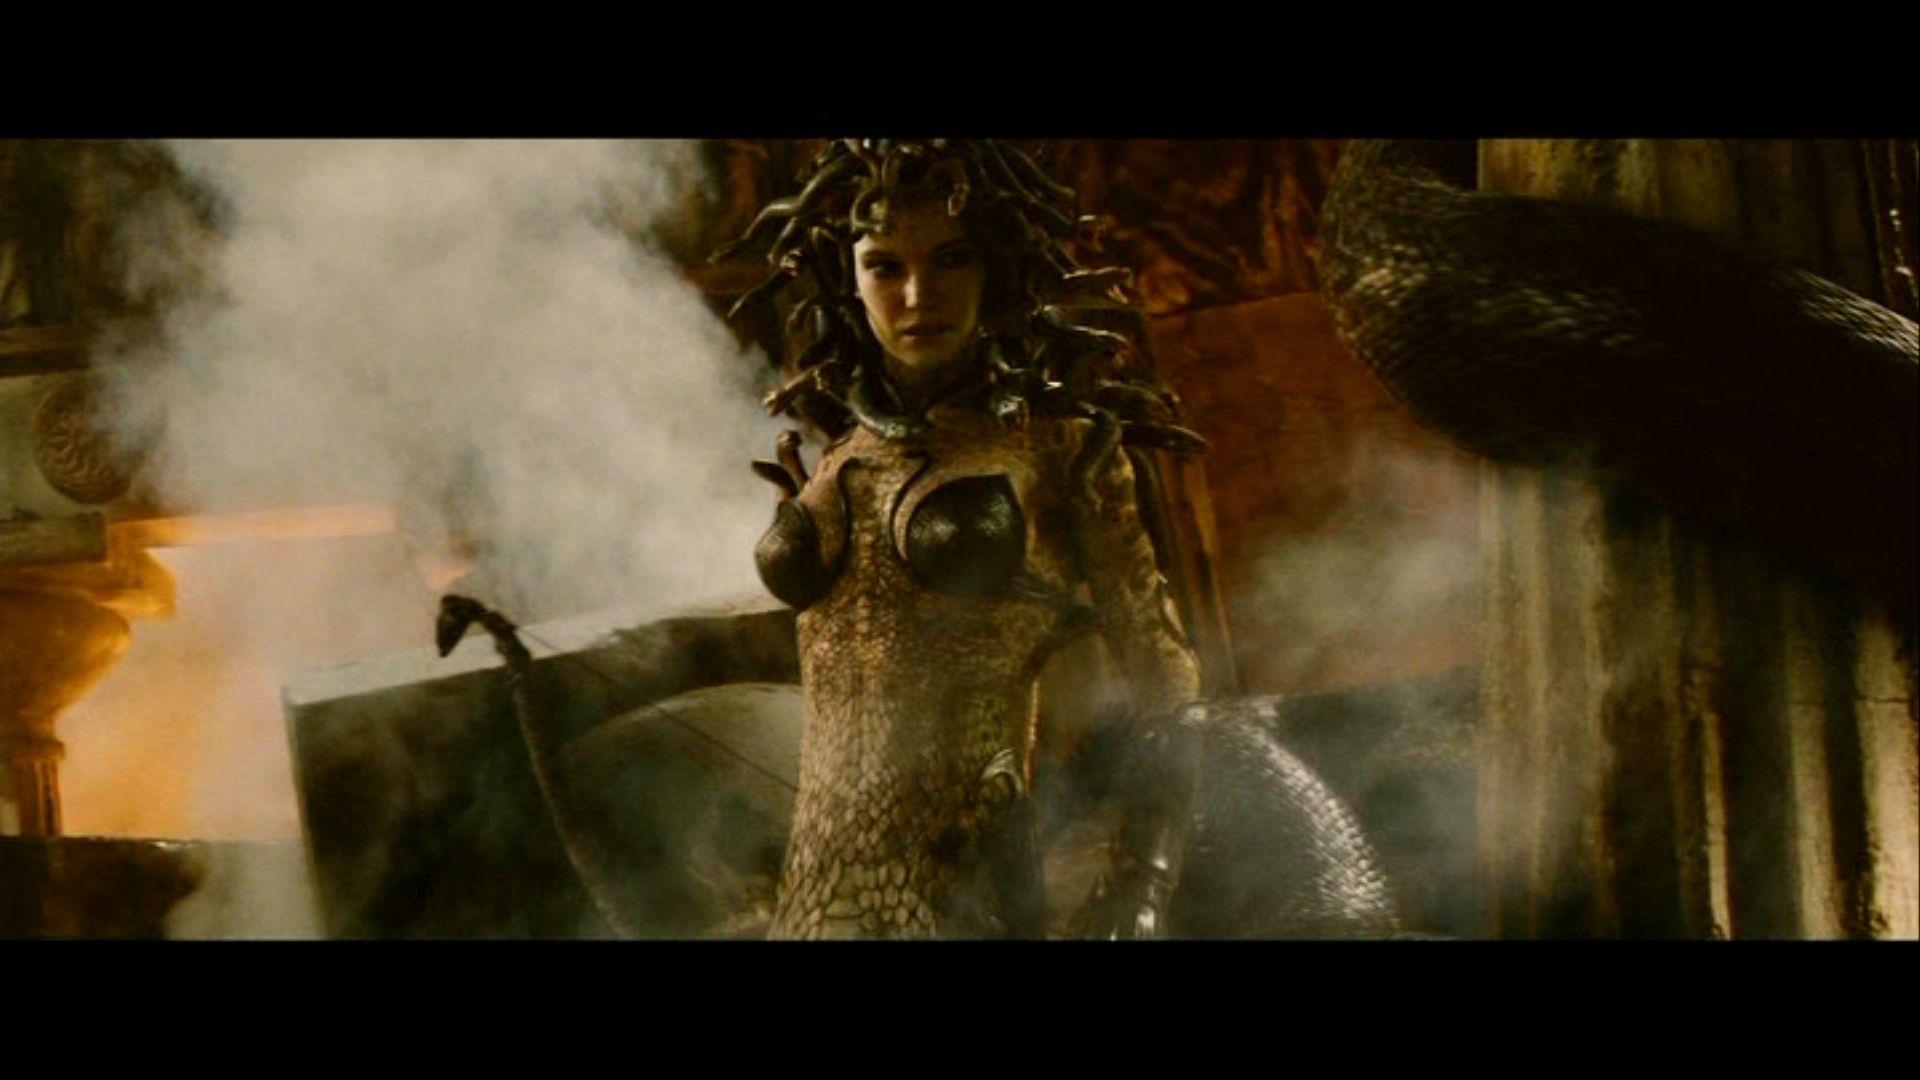 Clash Of The Titans Medusa Wallpaper Clash Of The Titans Movie